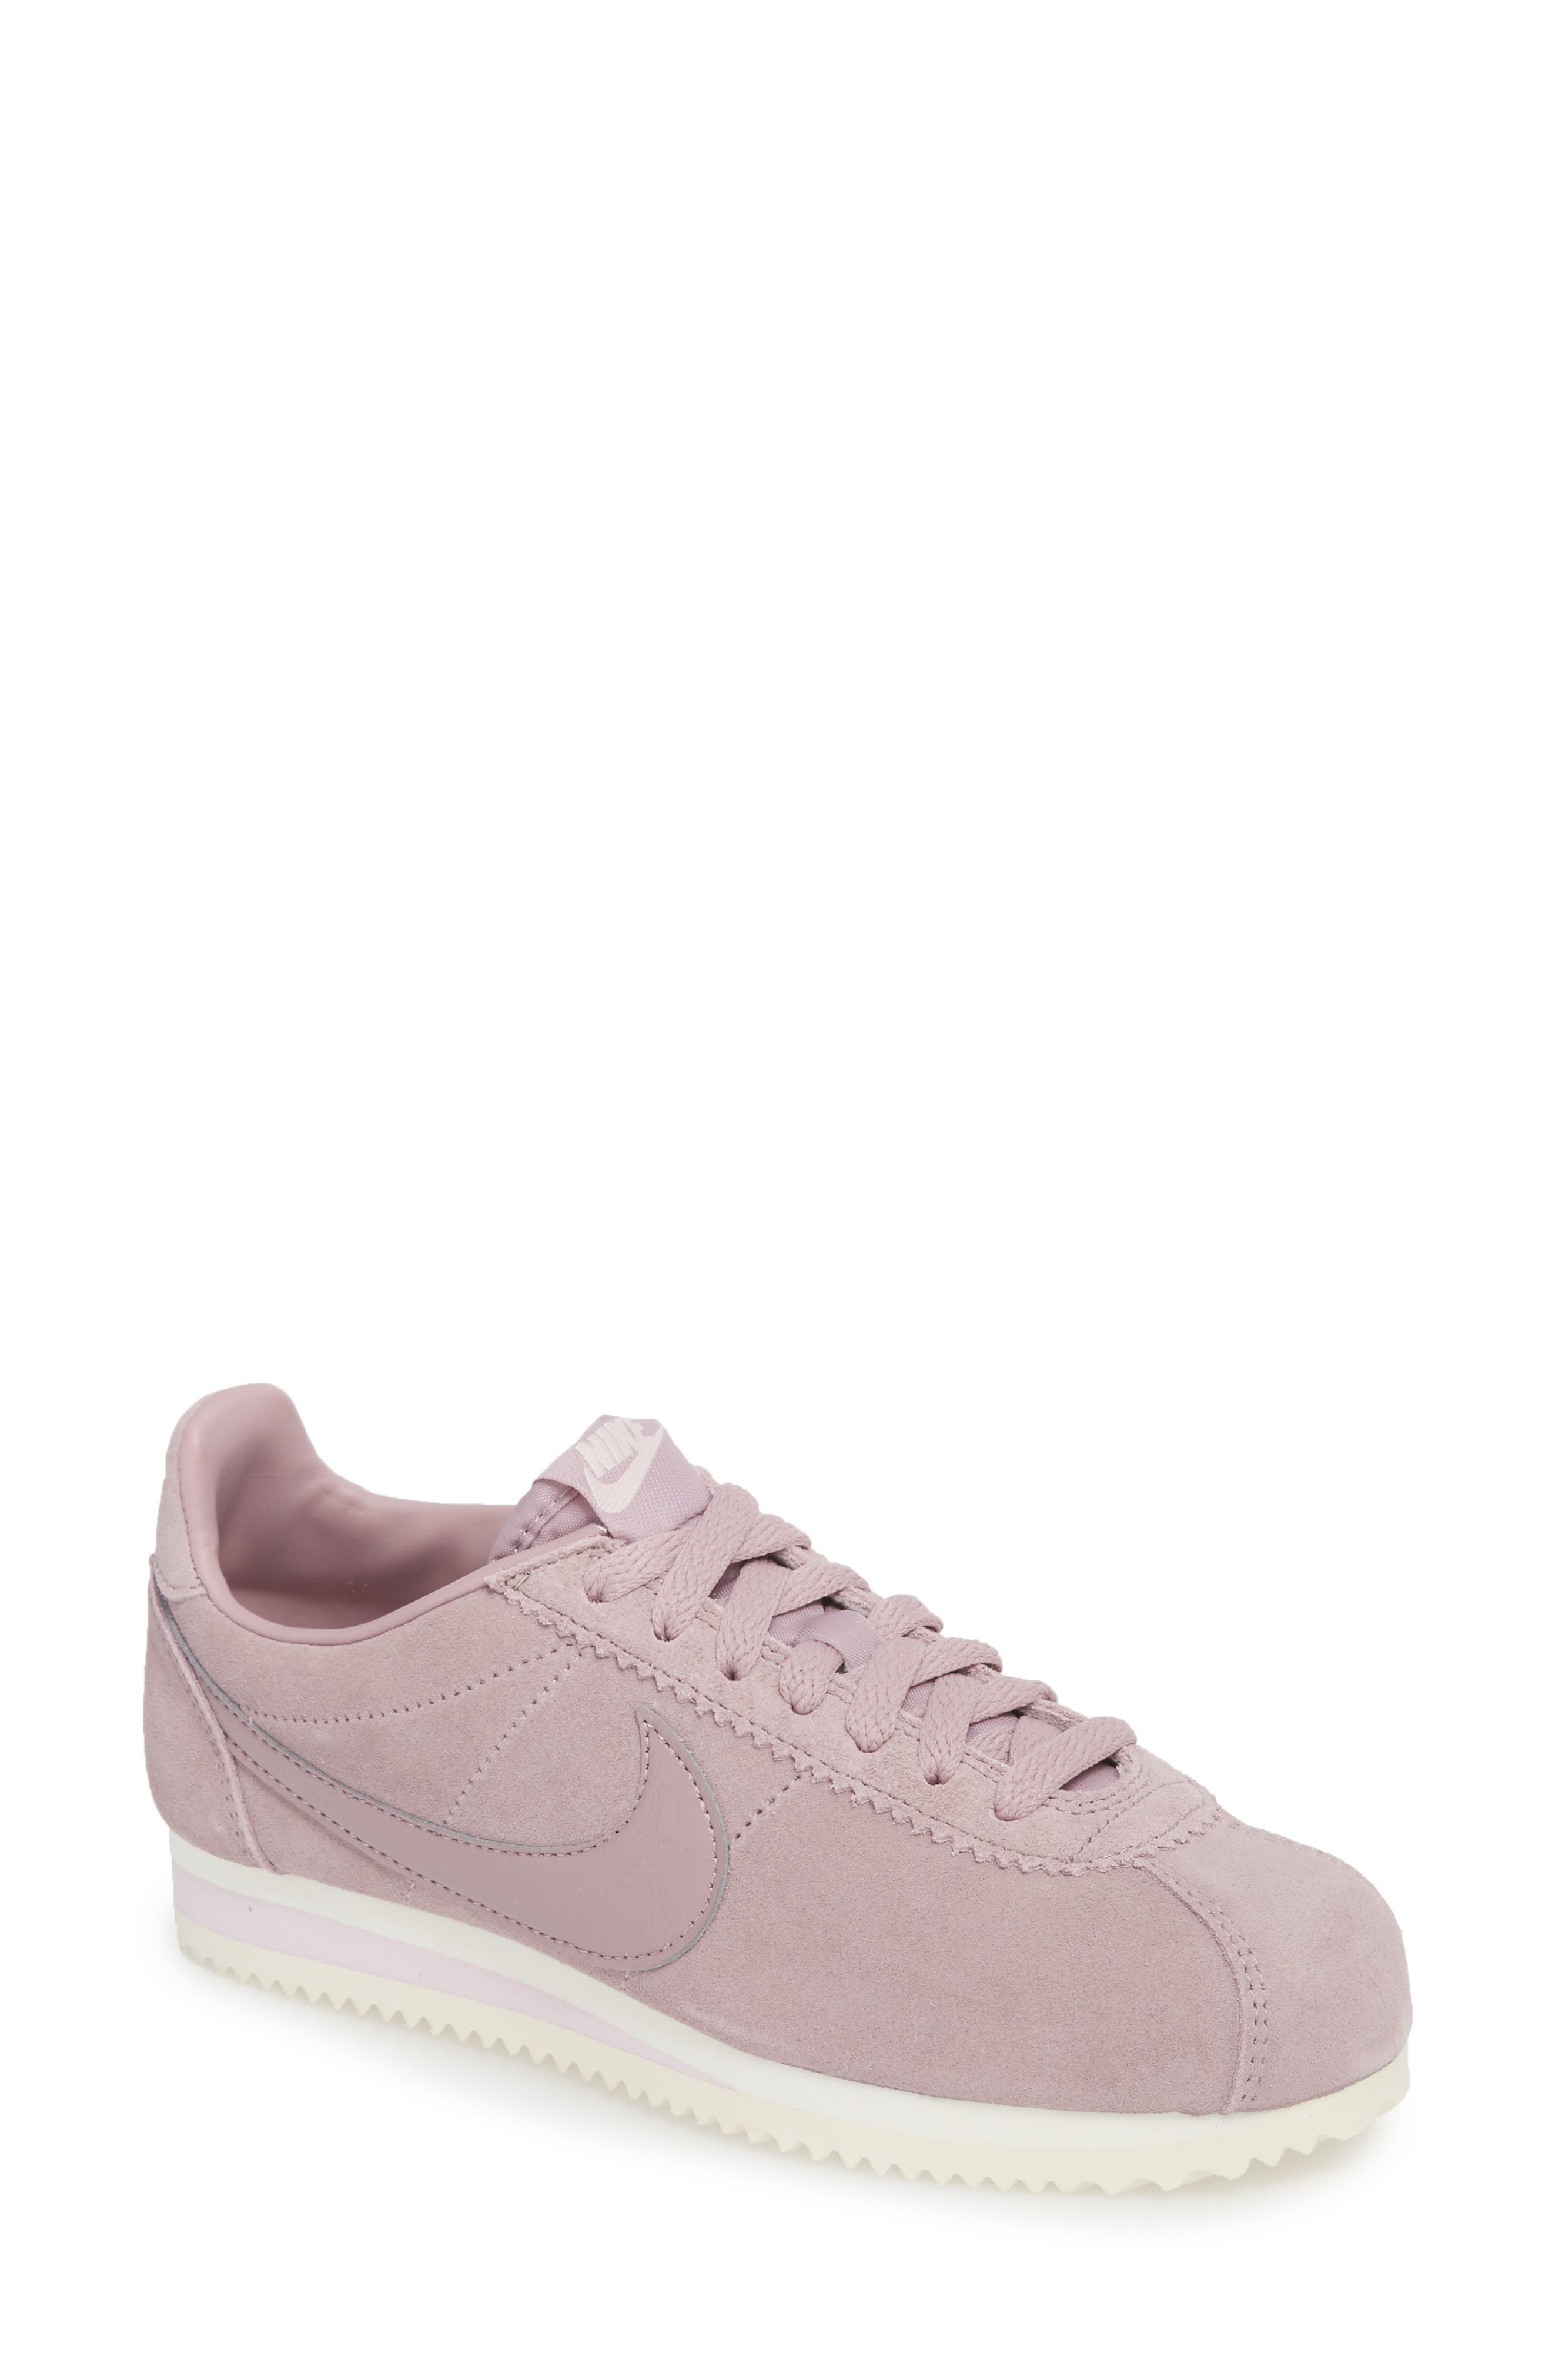 Classic Cortez Suede Sneaker,                         Main,                         color, Elemental Rose/ Elemental Rose